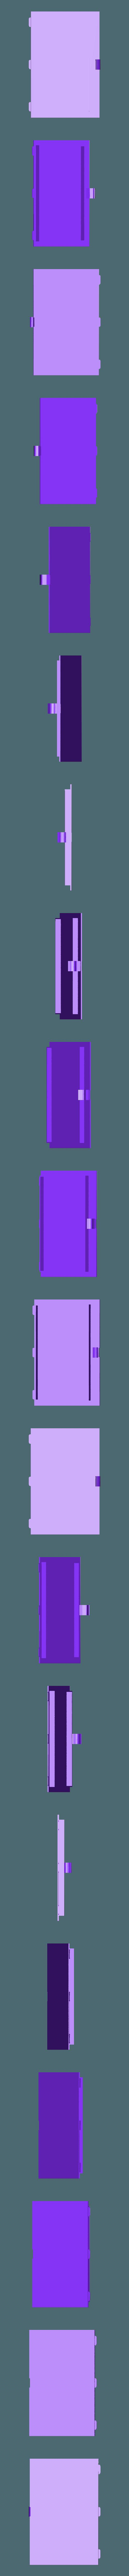 lighthouse-solar4blid.stl Download free STL file Solar Light House • 3D printing object, shermluge